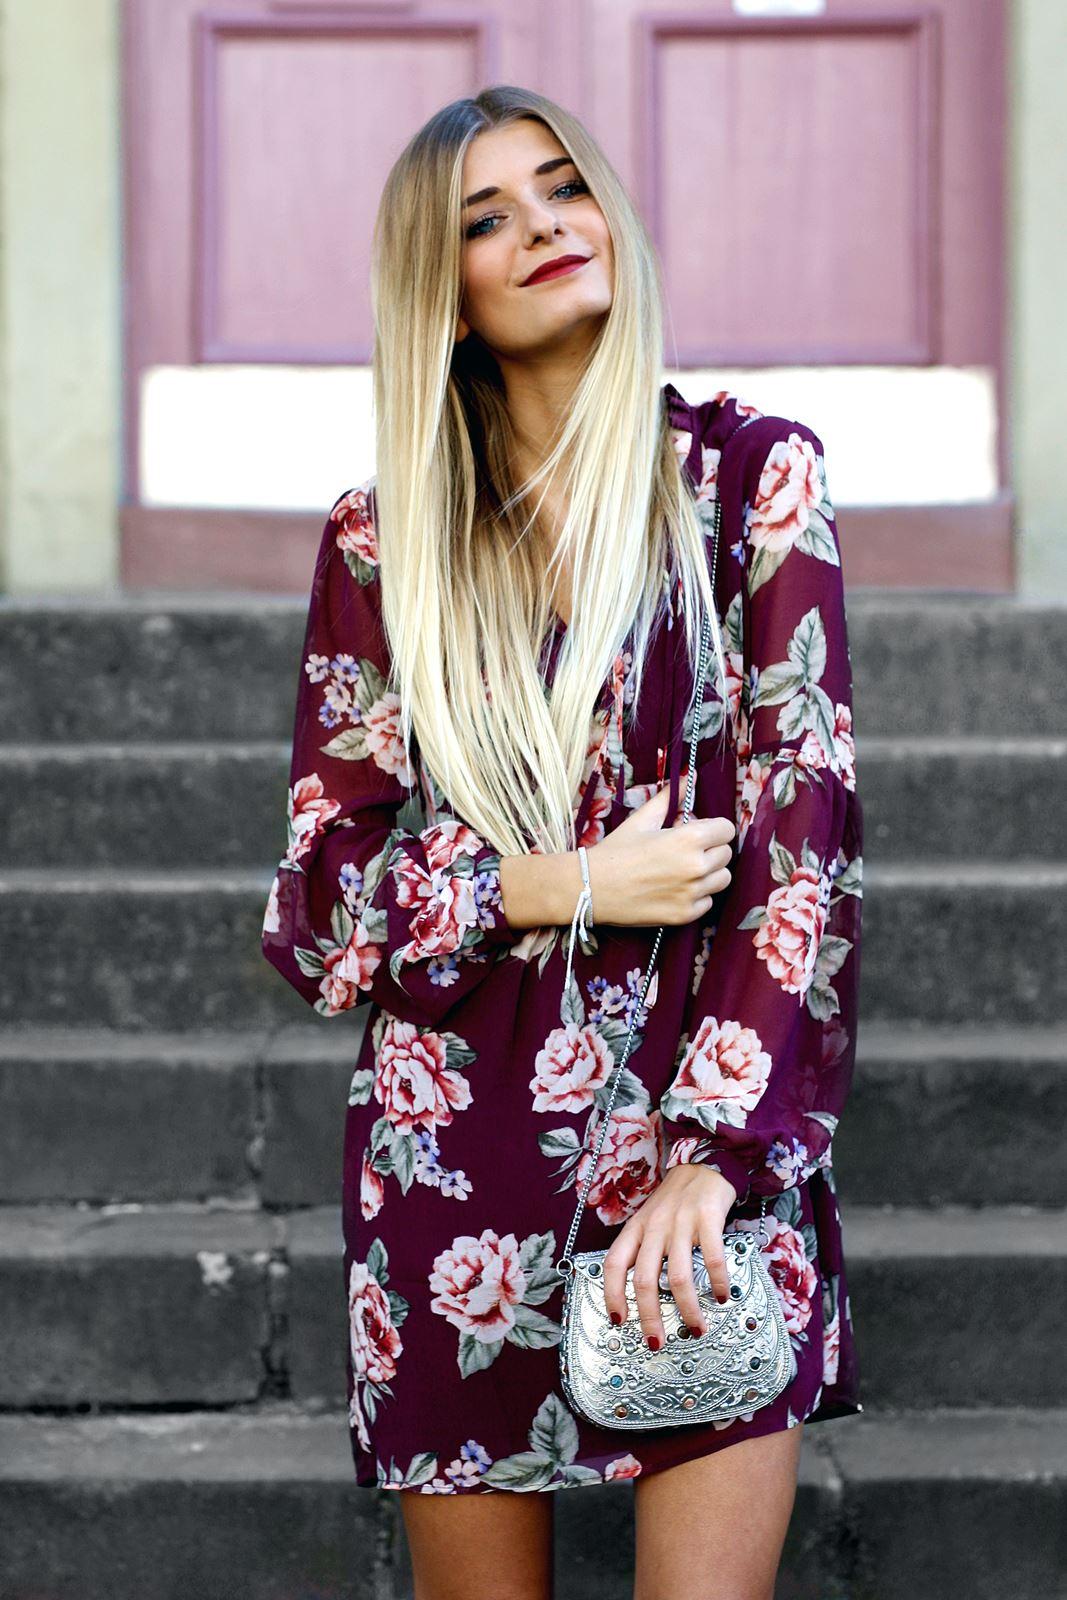 modeblog-german-fashion-blog-outfit-stiefeletten-rotes-blumenkleid-2